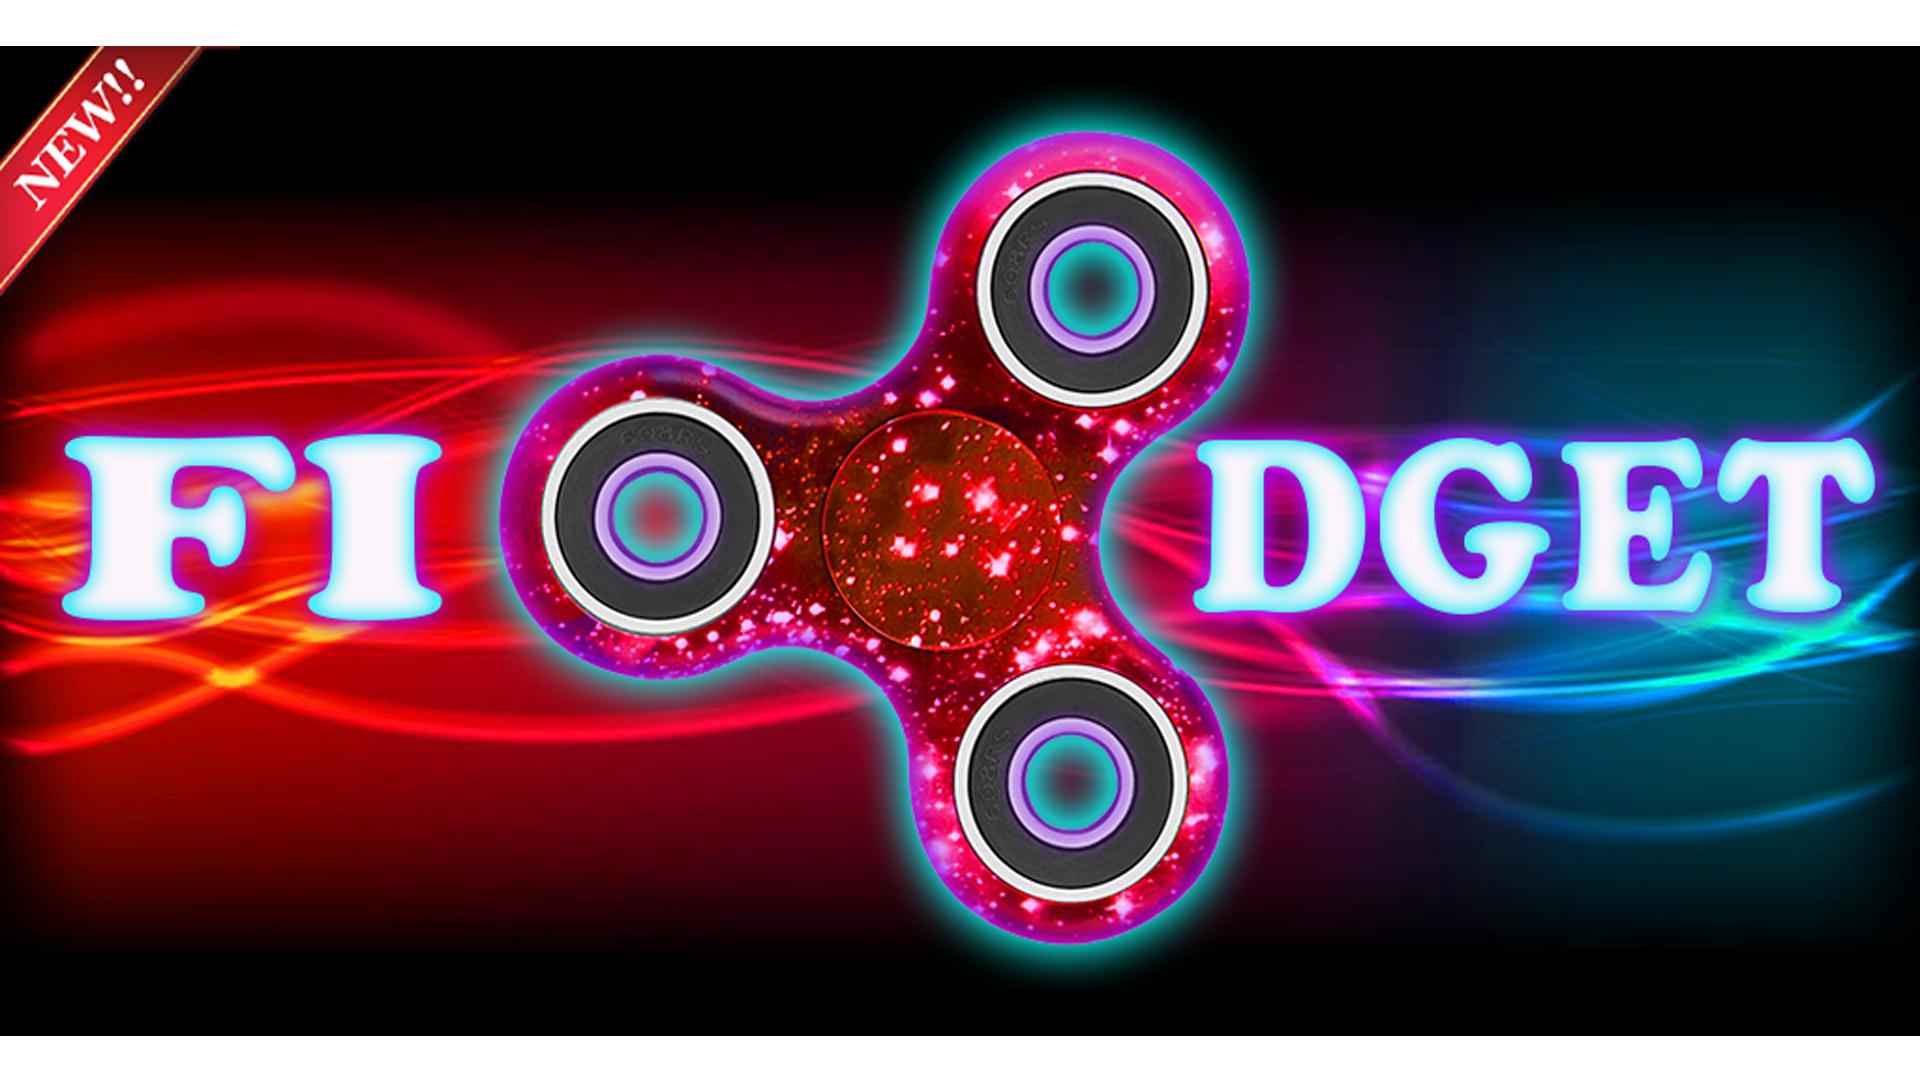 Free Fidget Spiner 2017